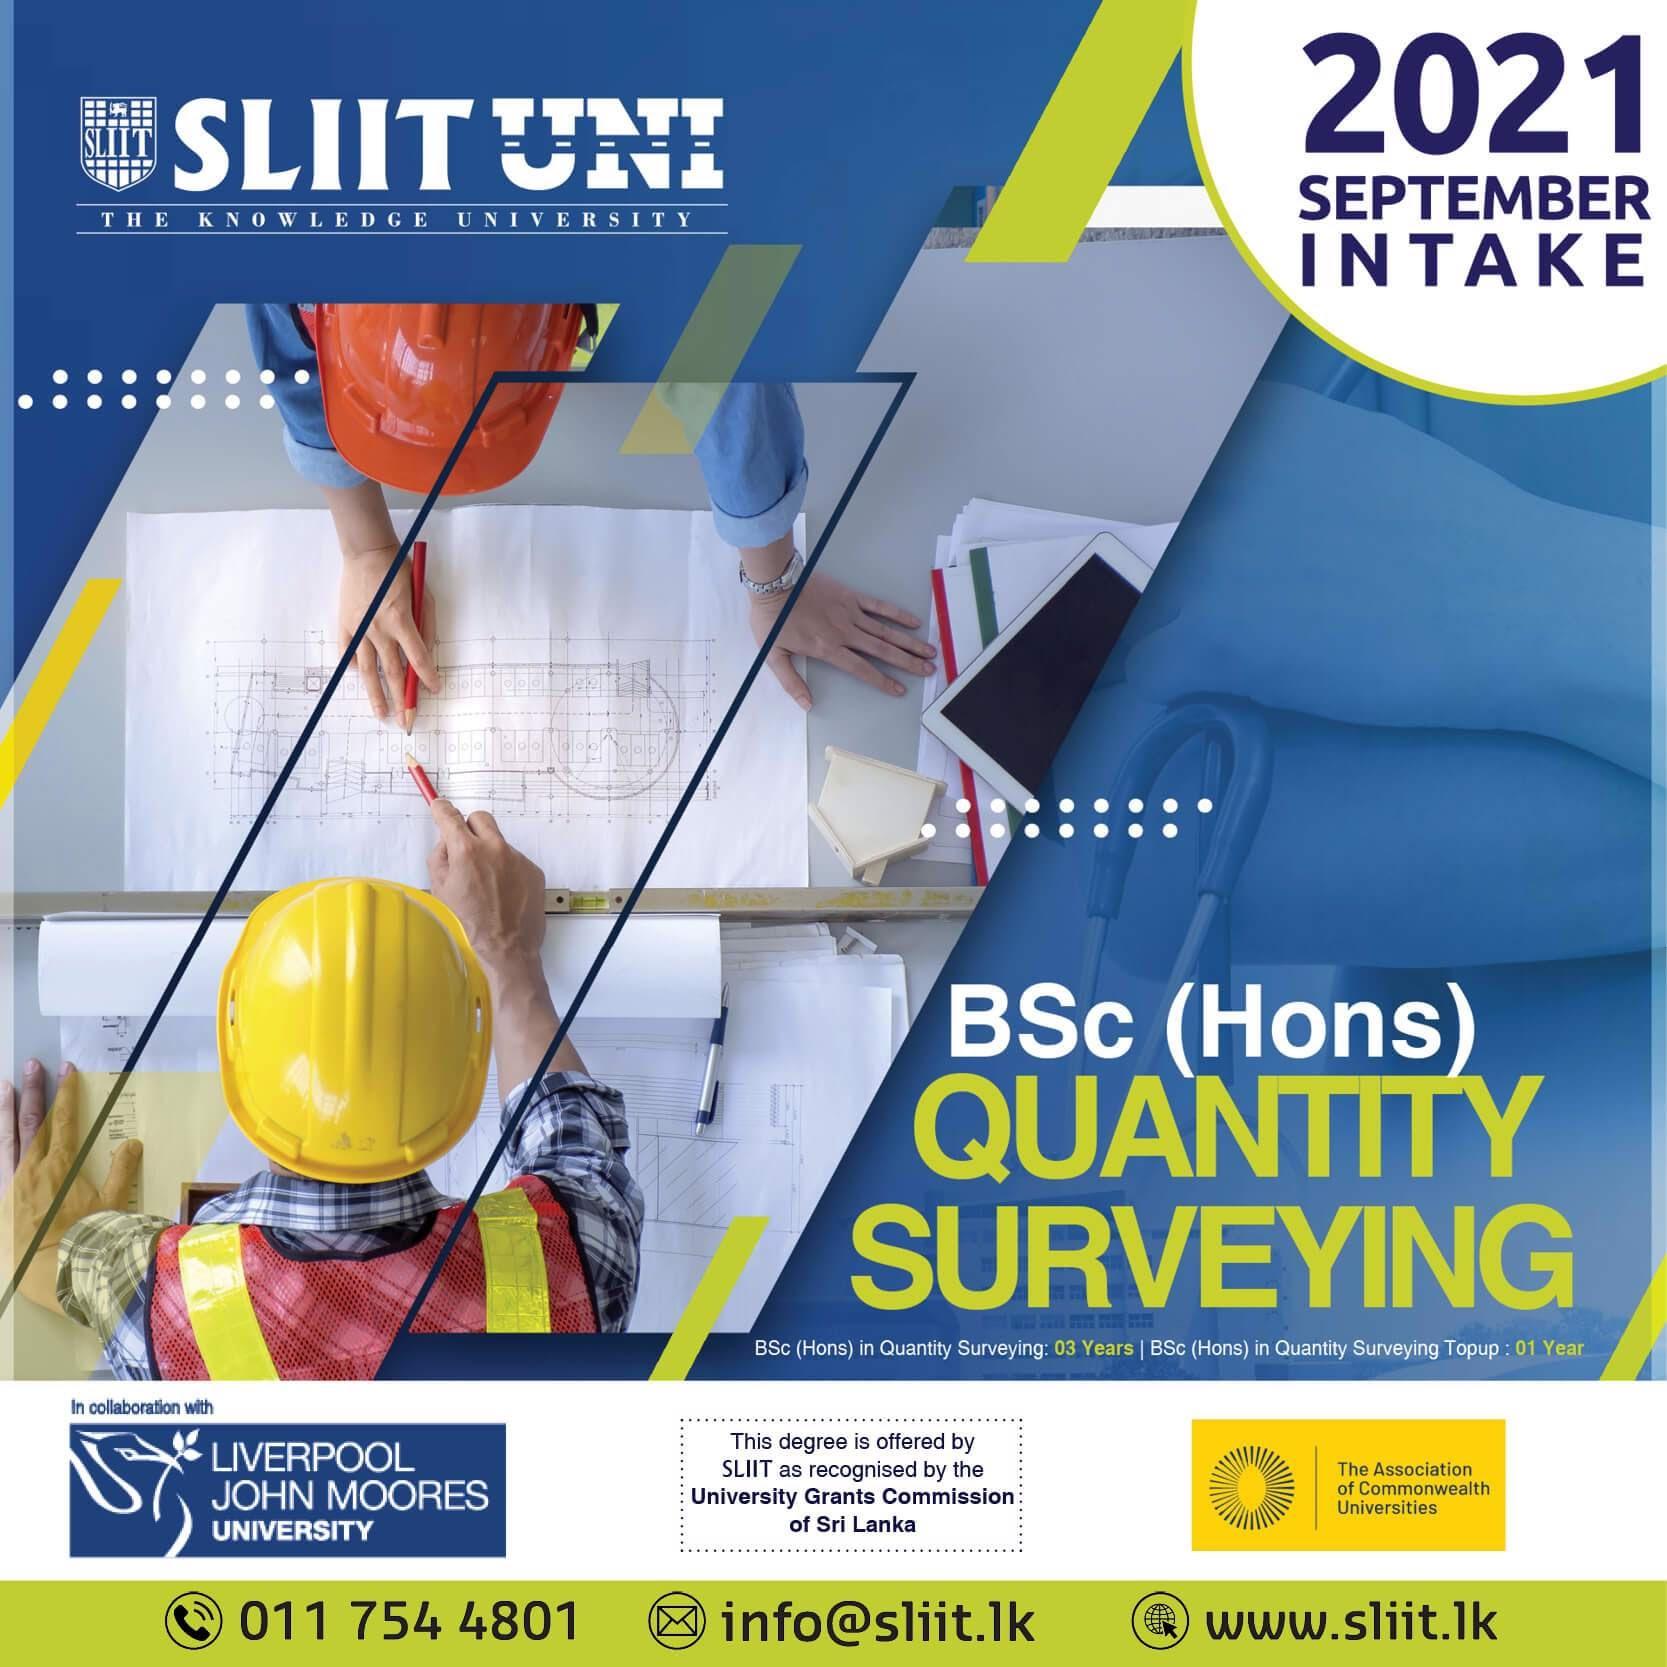 A British Quantity Surveying Degree Now at SLIIT